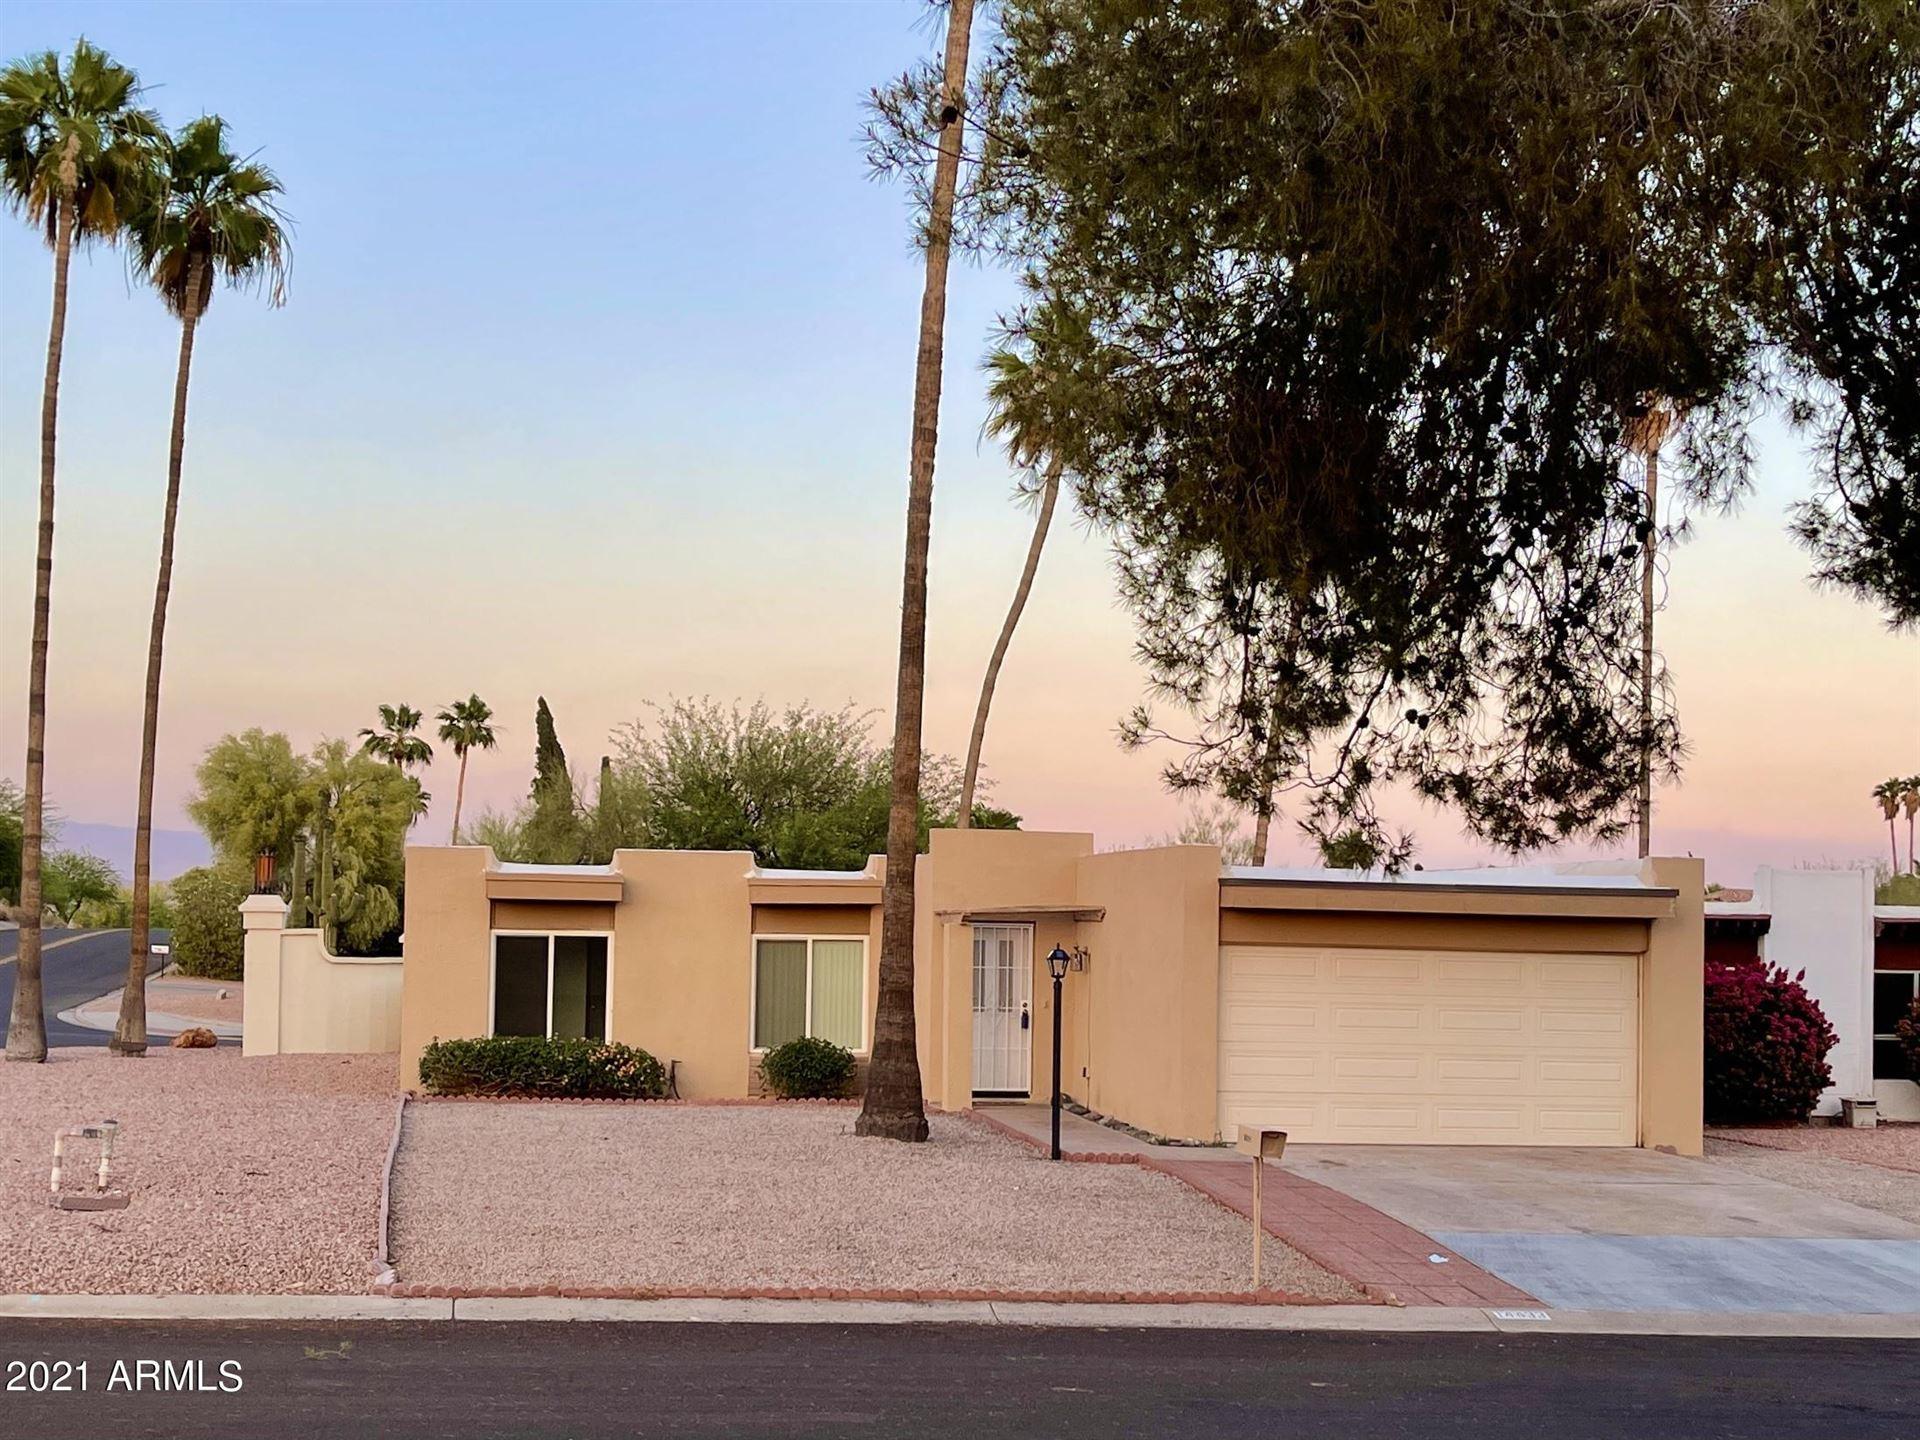 14433 N CALLE DEL ORO Drive, Fountain Hills, AZ 85268 - MLS#: 6246388